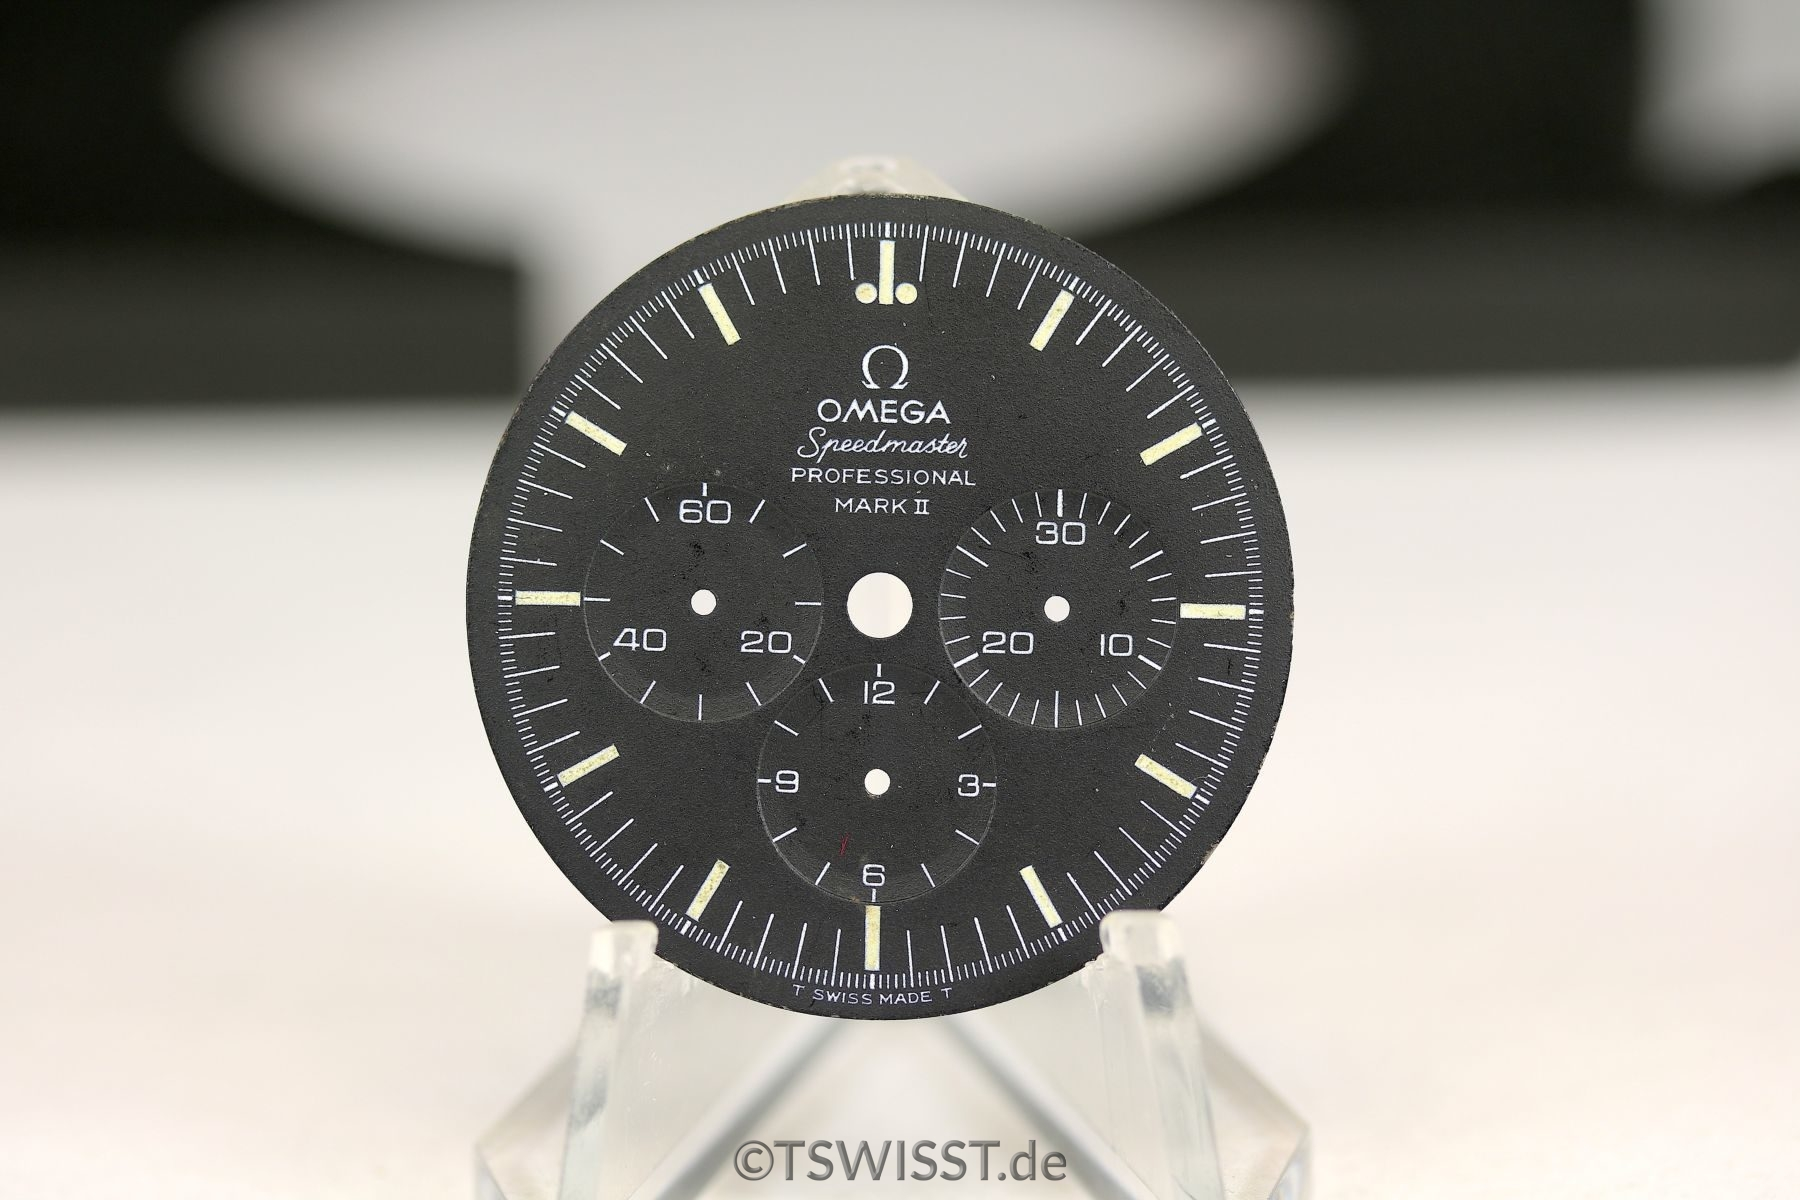 Omega Speedmaster MK II dial